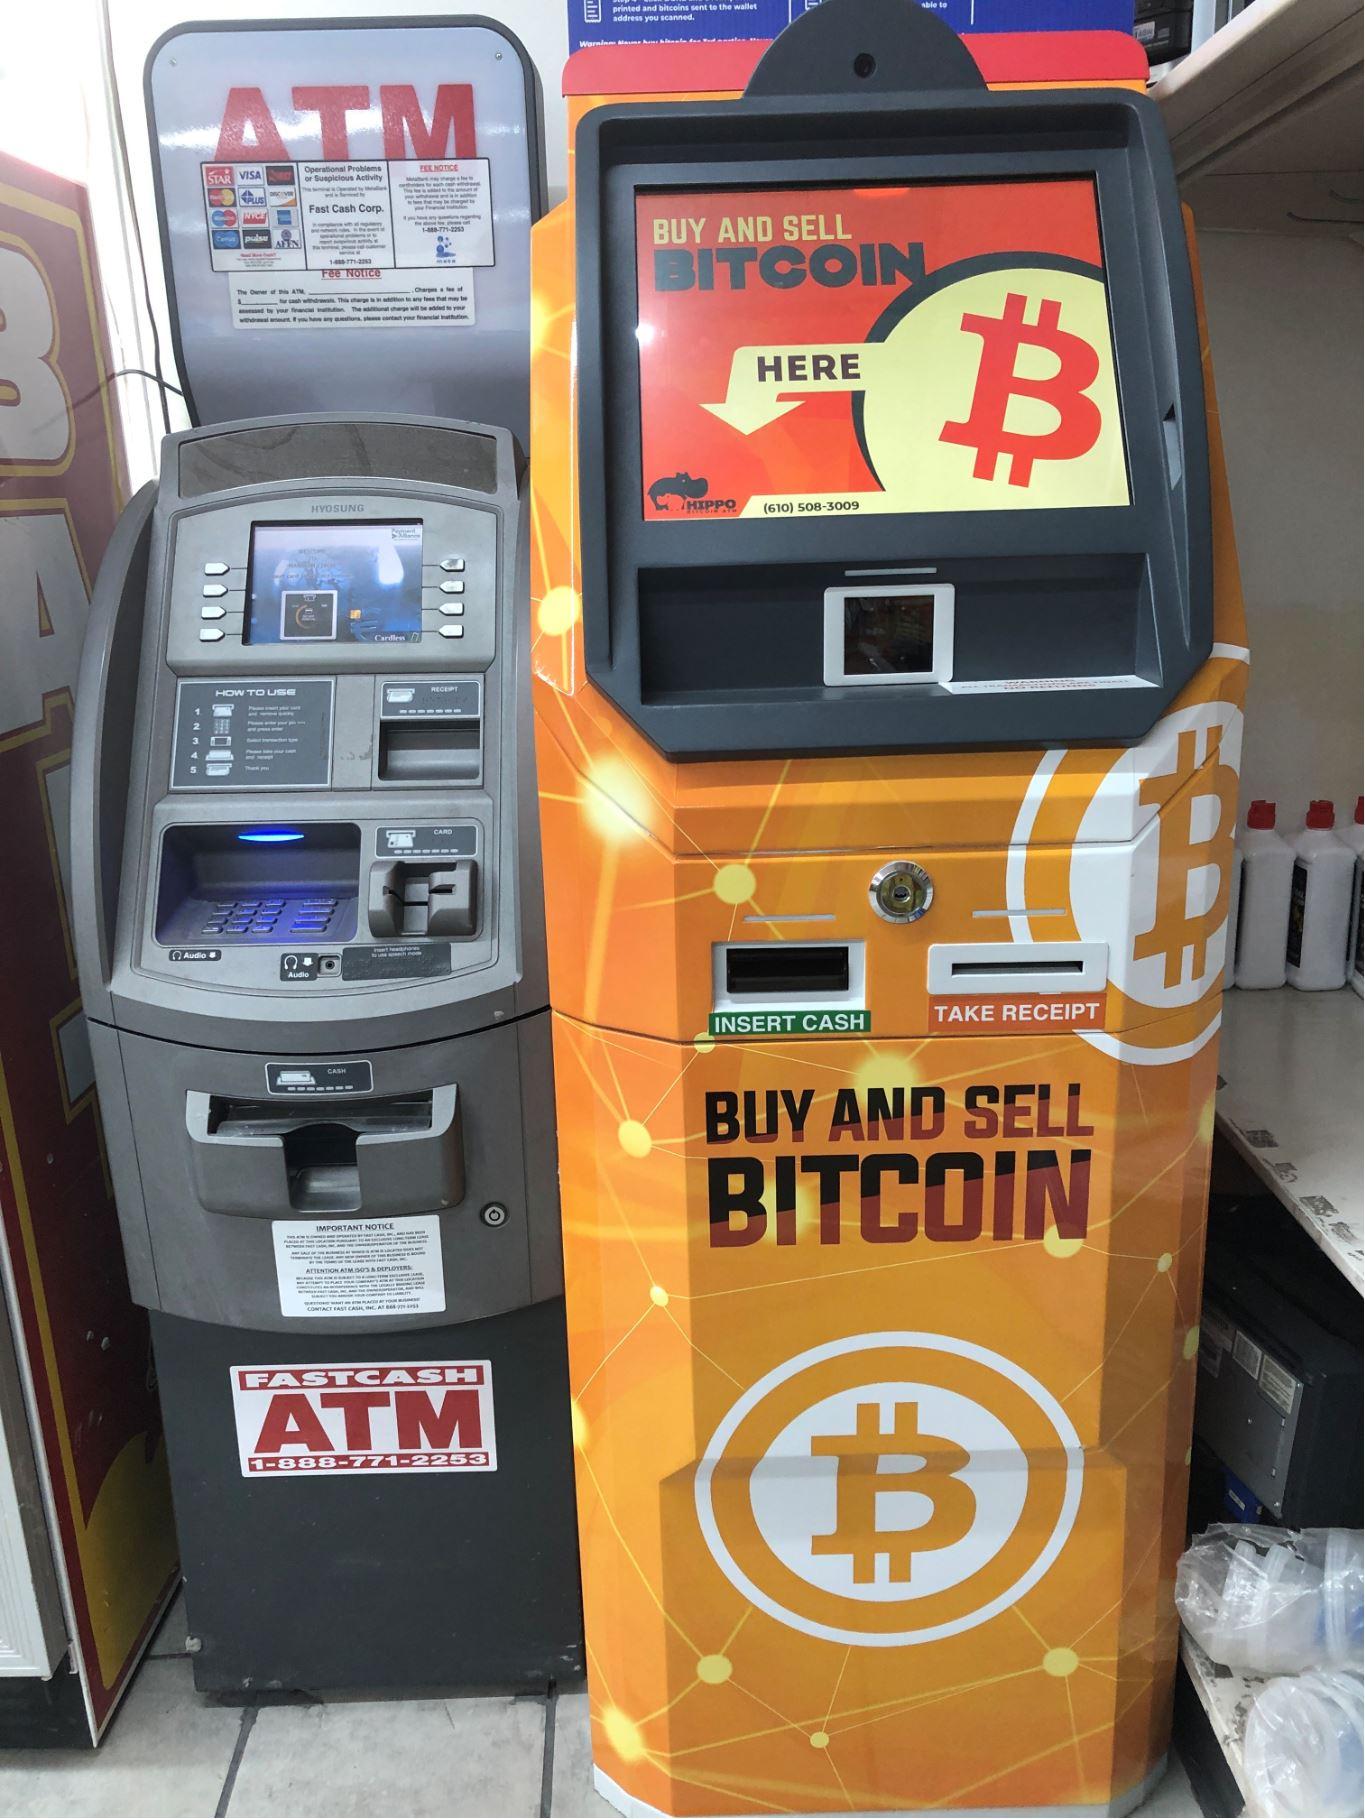 Bitcoin ATM Mannheim PA Hippo ATM Kiosks produced by ChainBytes